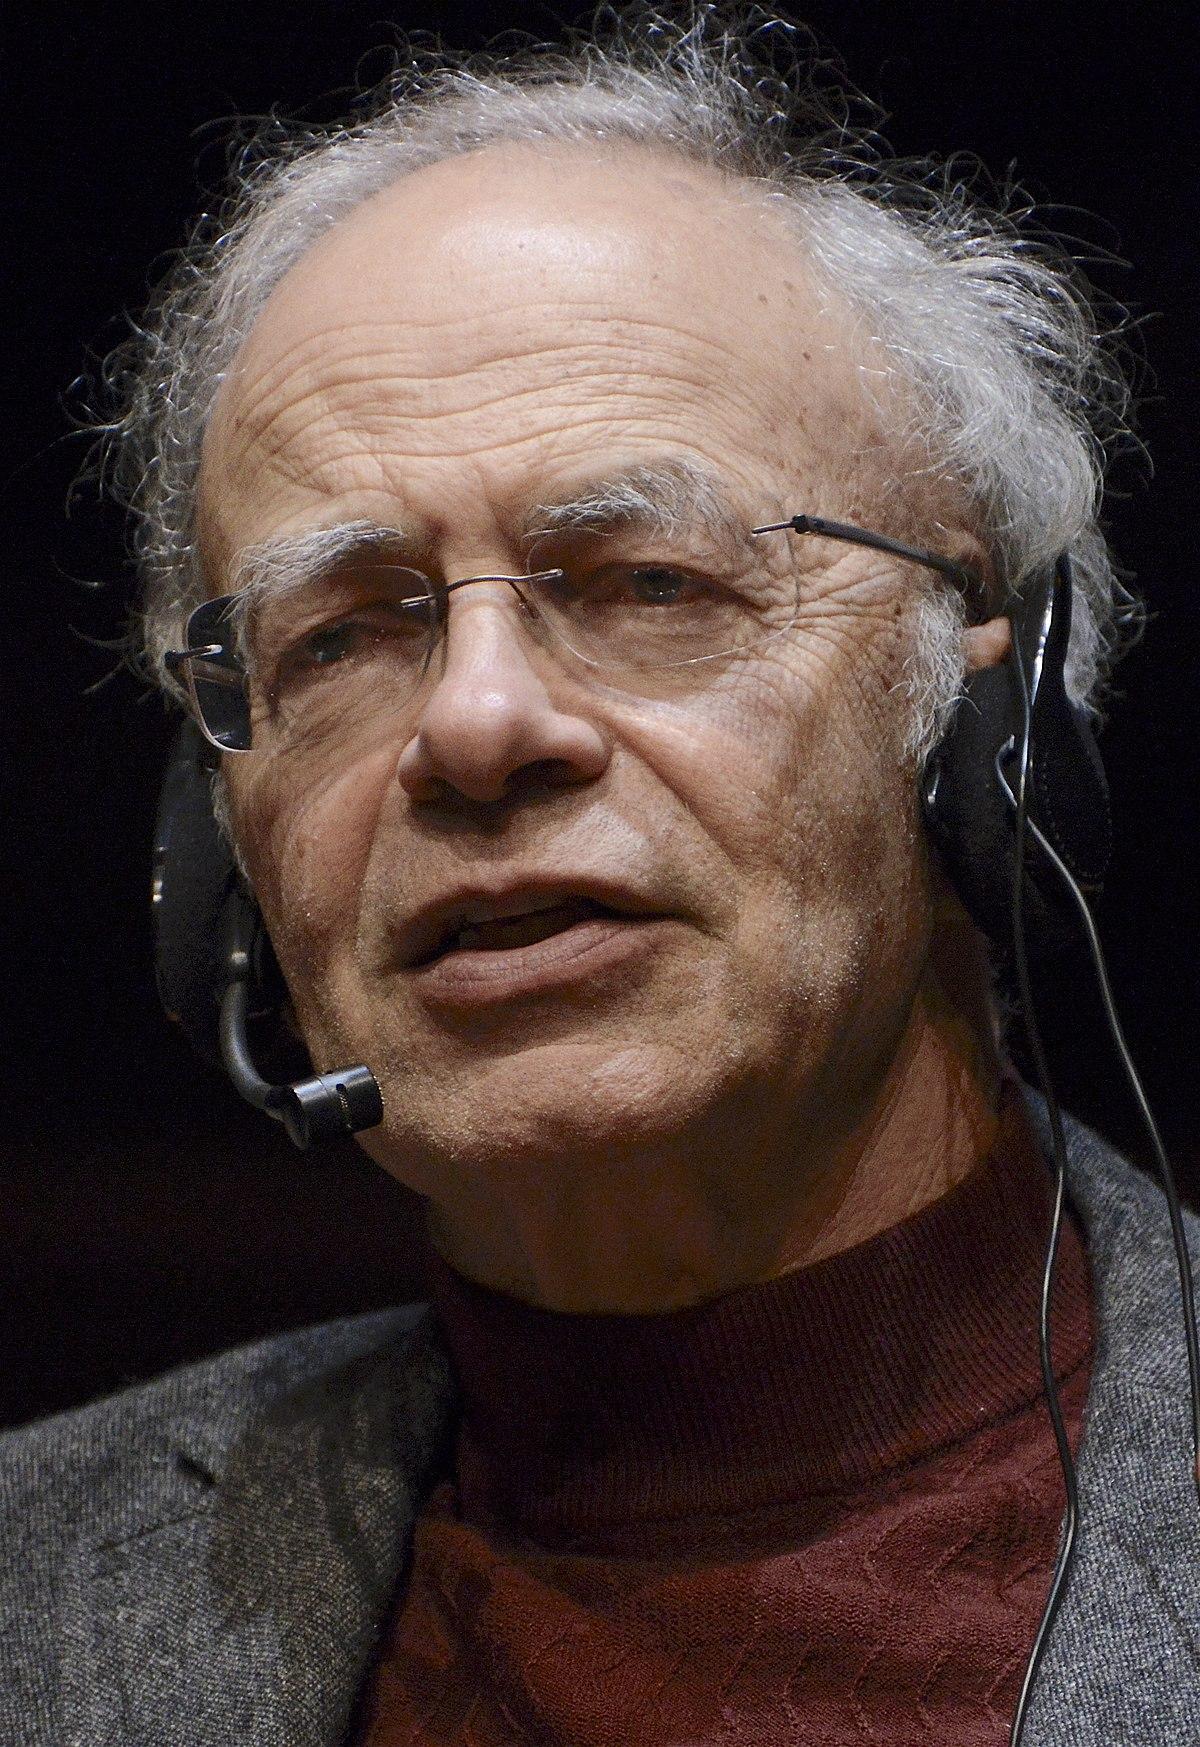 Princeton bioethics professor faces calls for resignation over infanticide support